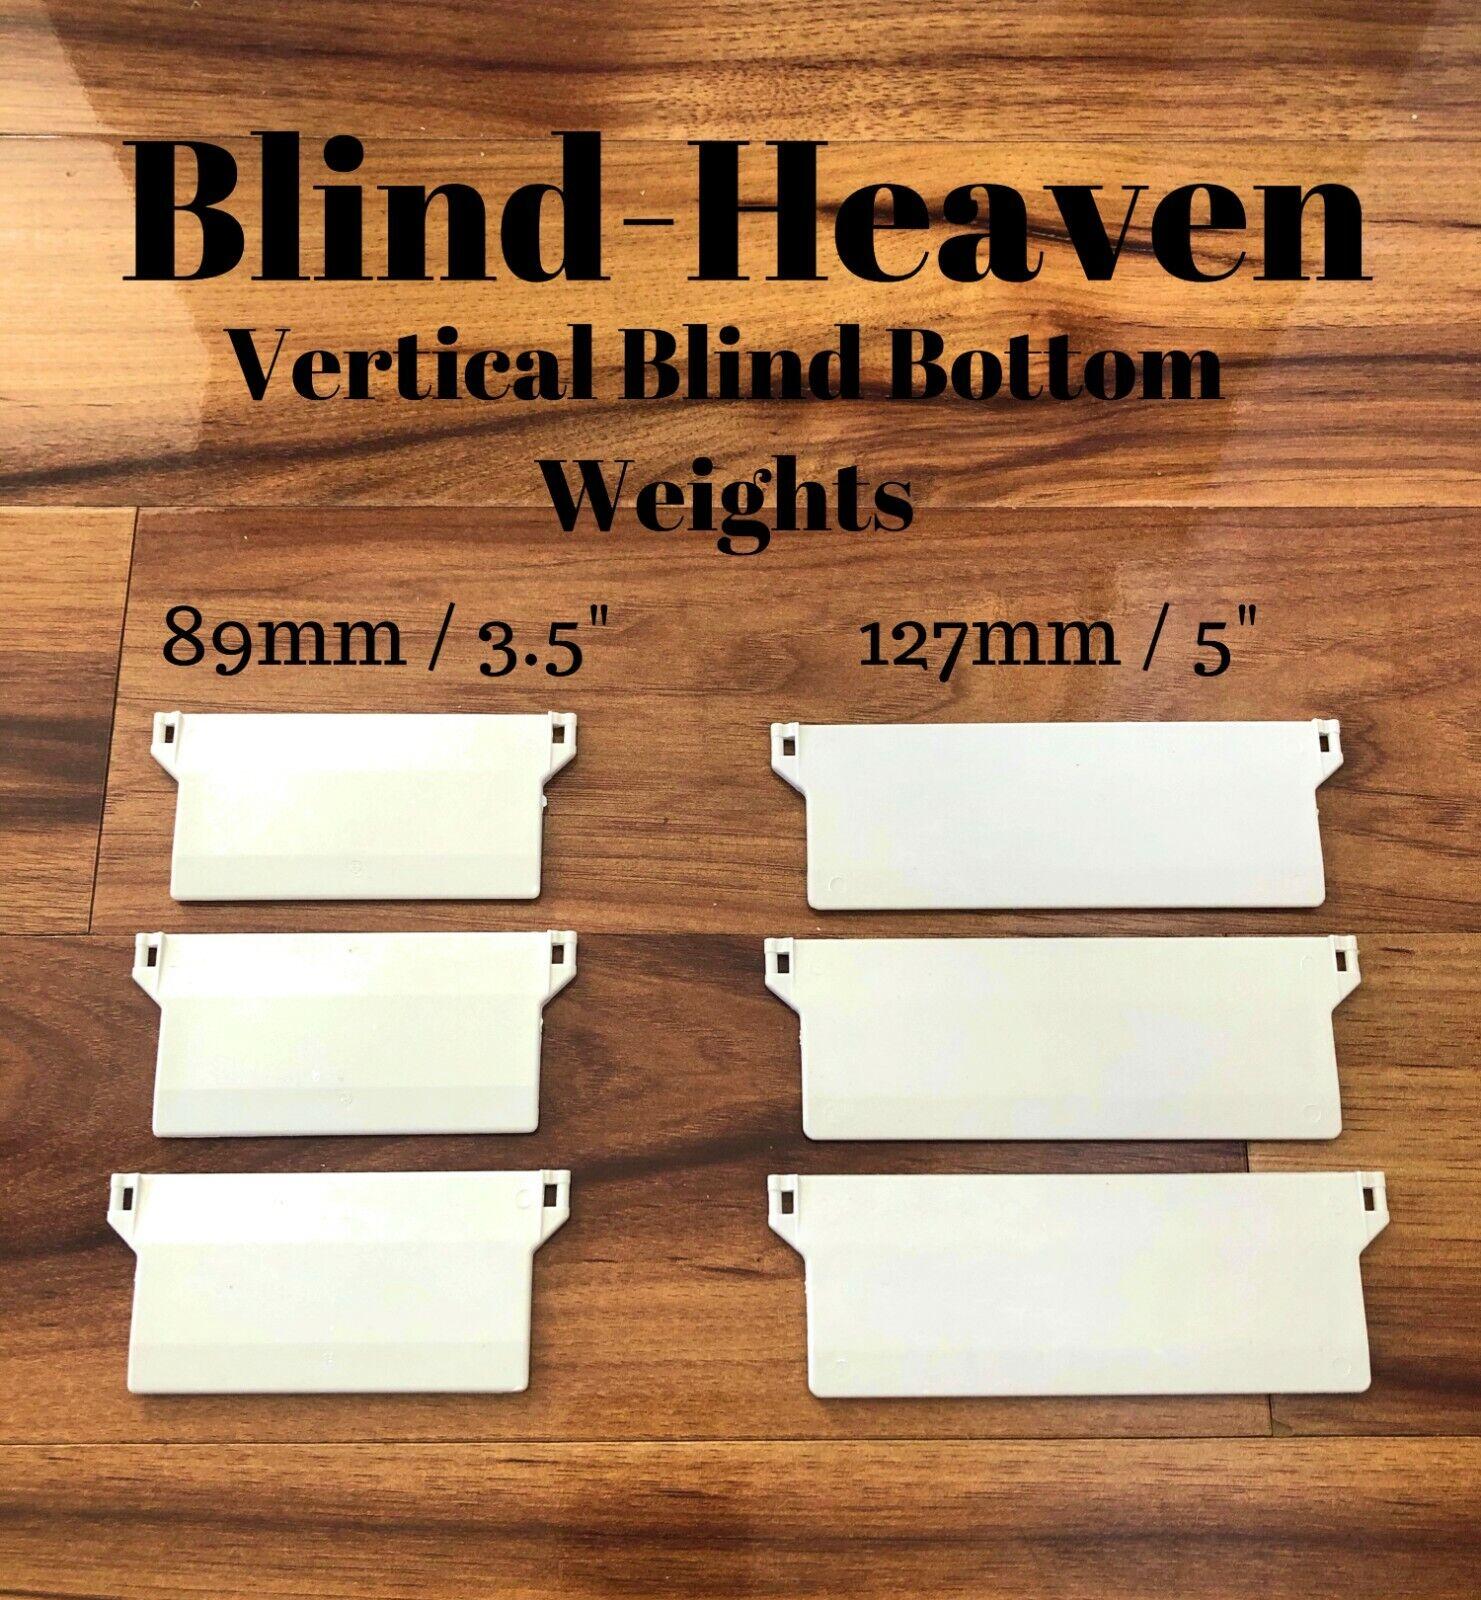 10 PACK of VERTICAL BLIND 89mm / 3.5″ & 127mm / 5″  BOTTOM WEIGHTS Blind Spares